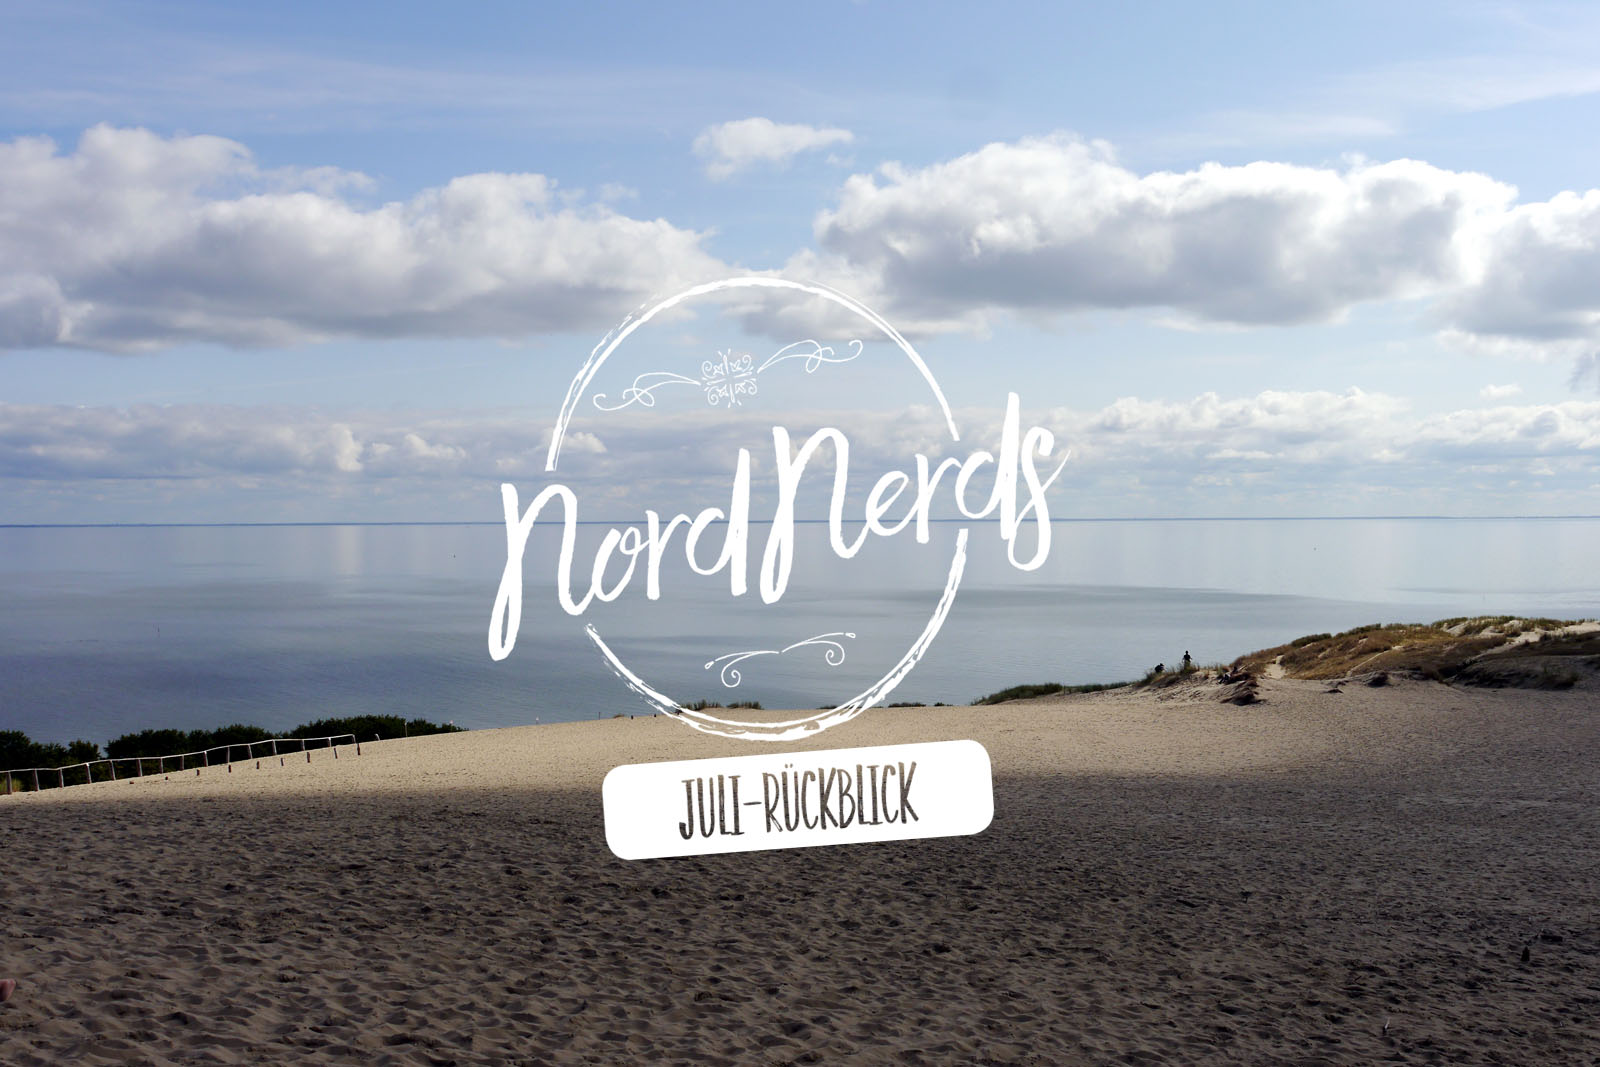 NordNerds Monatsrueckblick Juli 2020